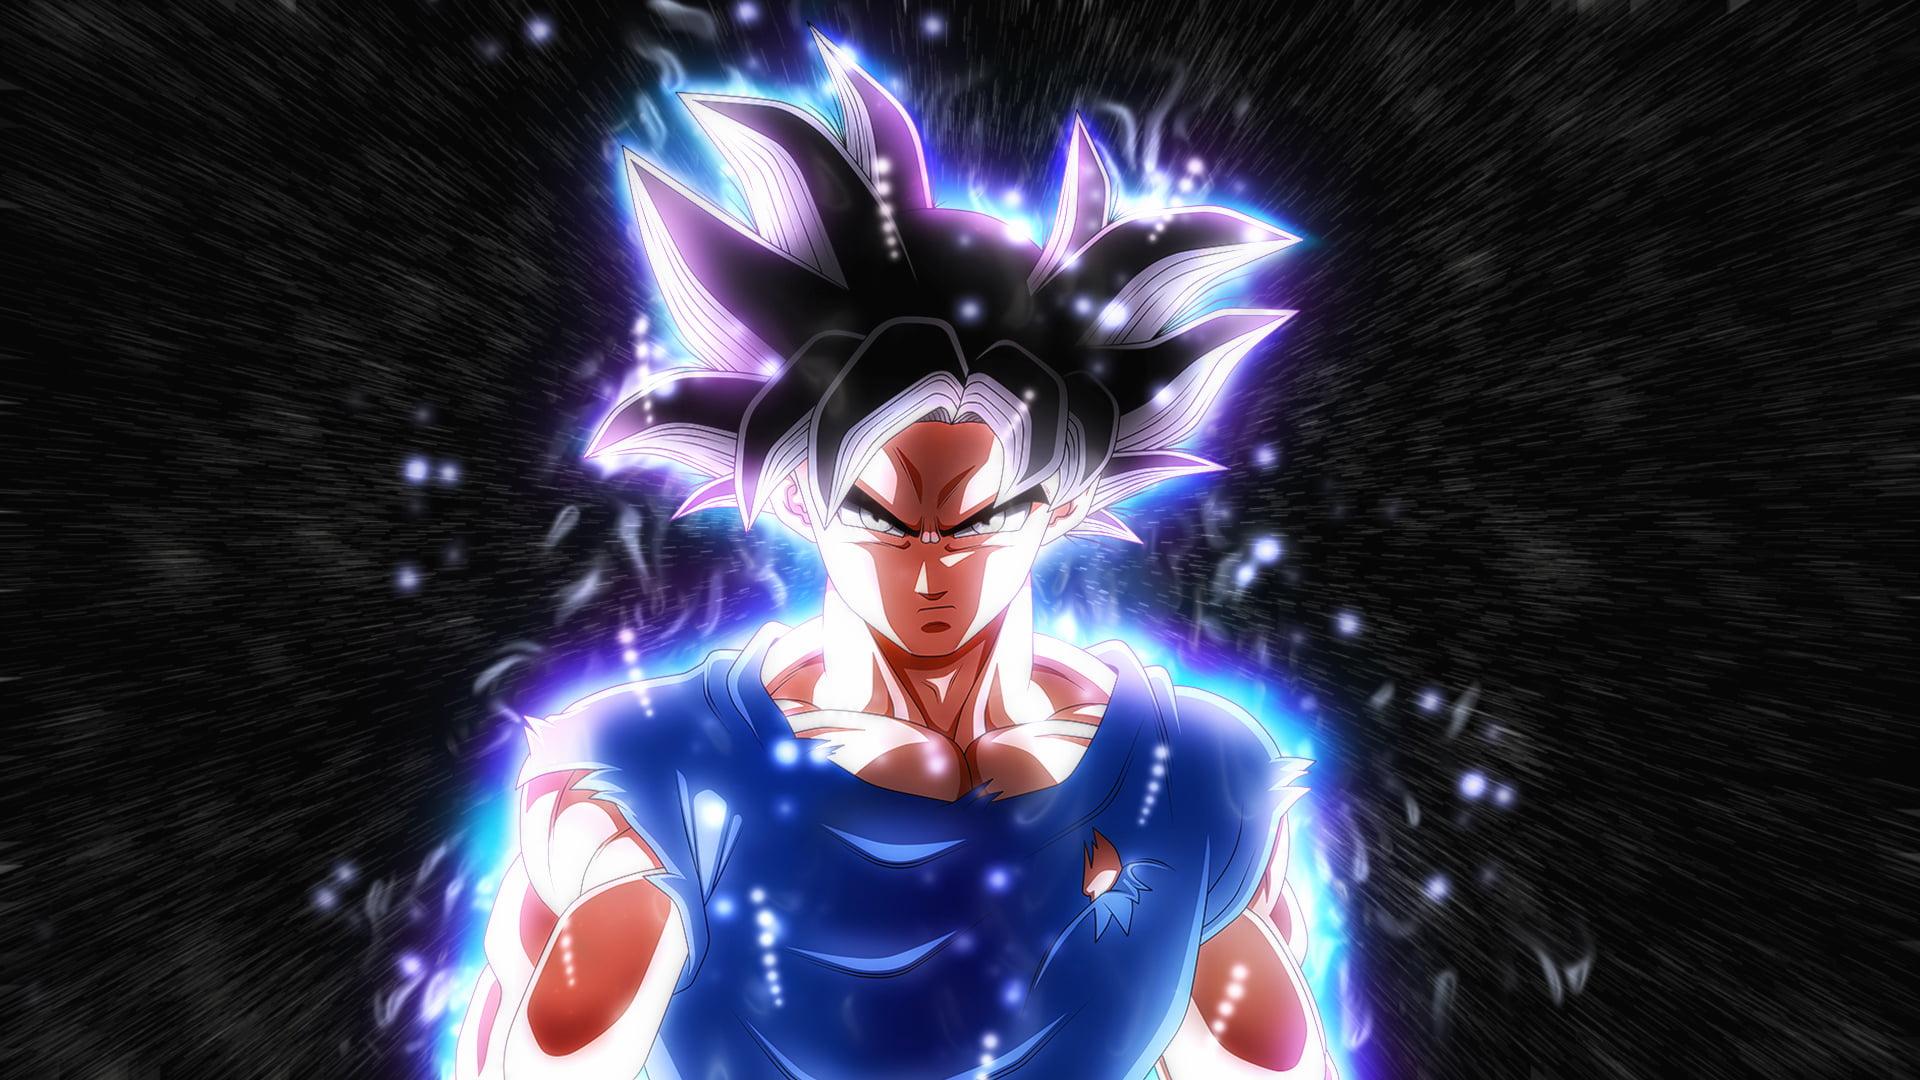 Son Goku Ultra Instinct 1920x1080 Wallpaper Teahub Io